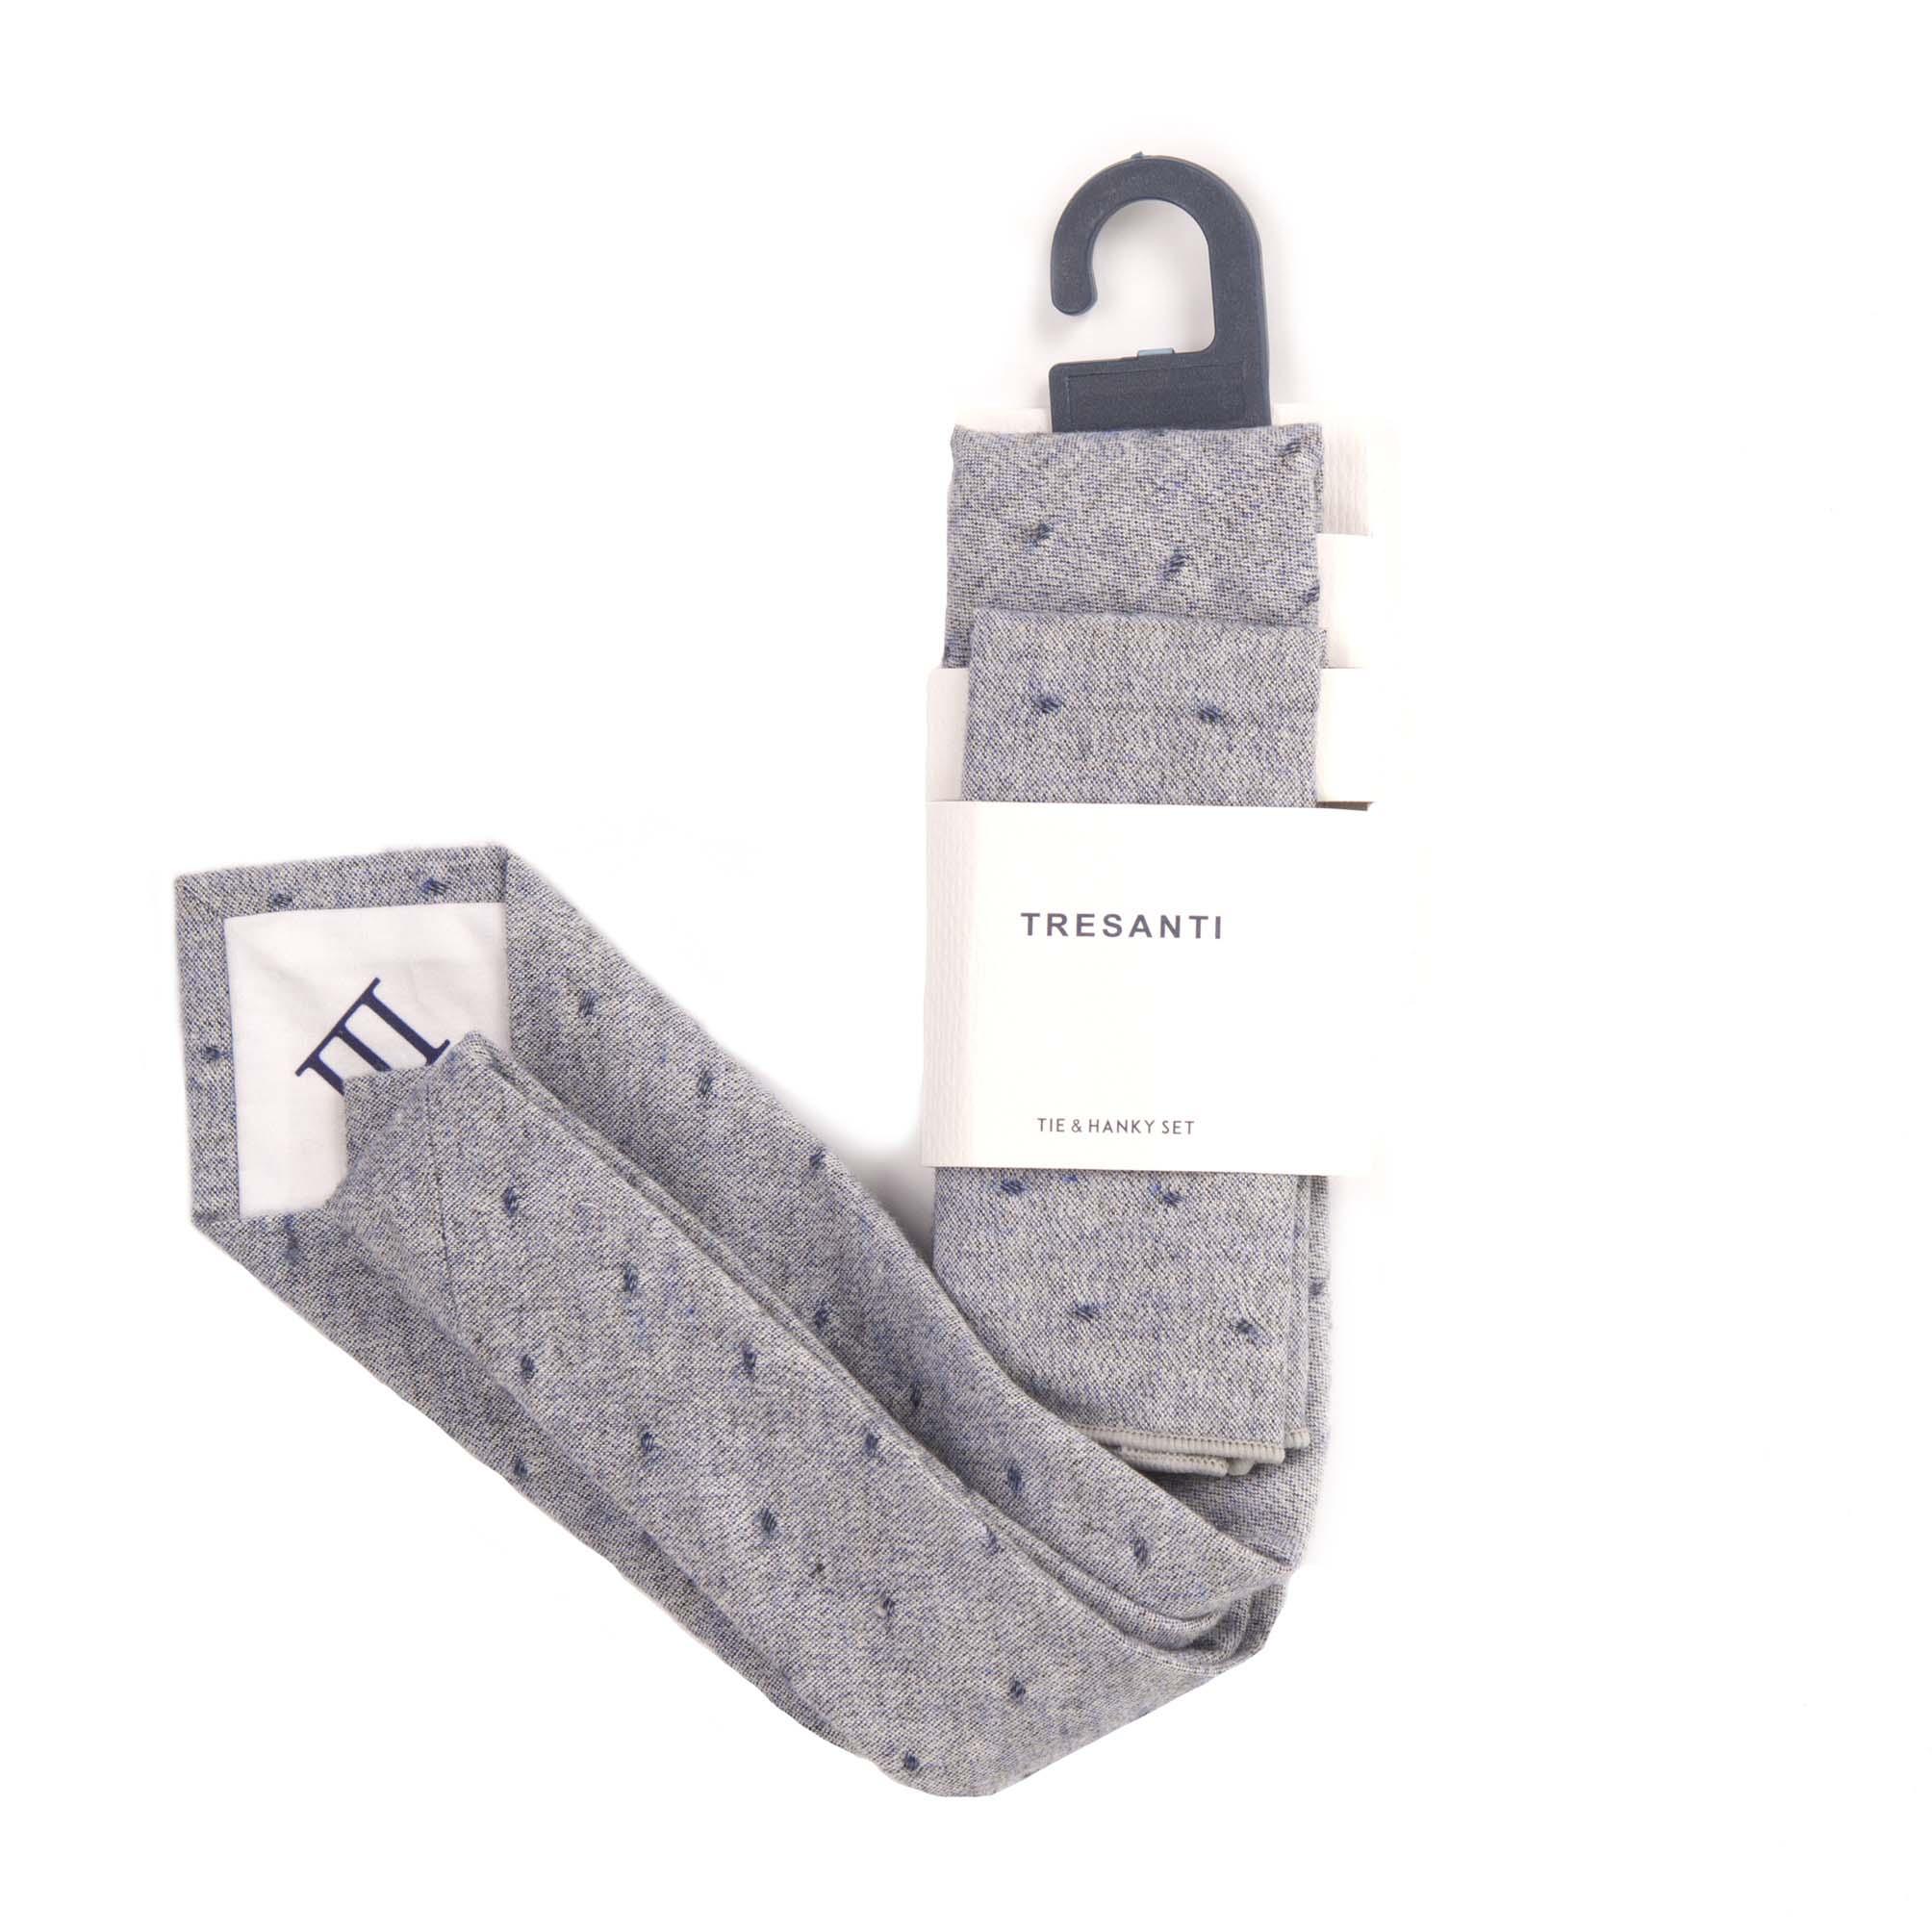 Tie & hanky set light grey with dots